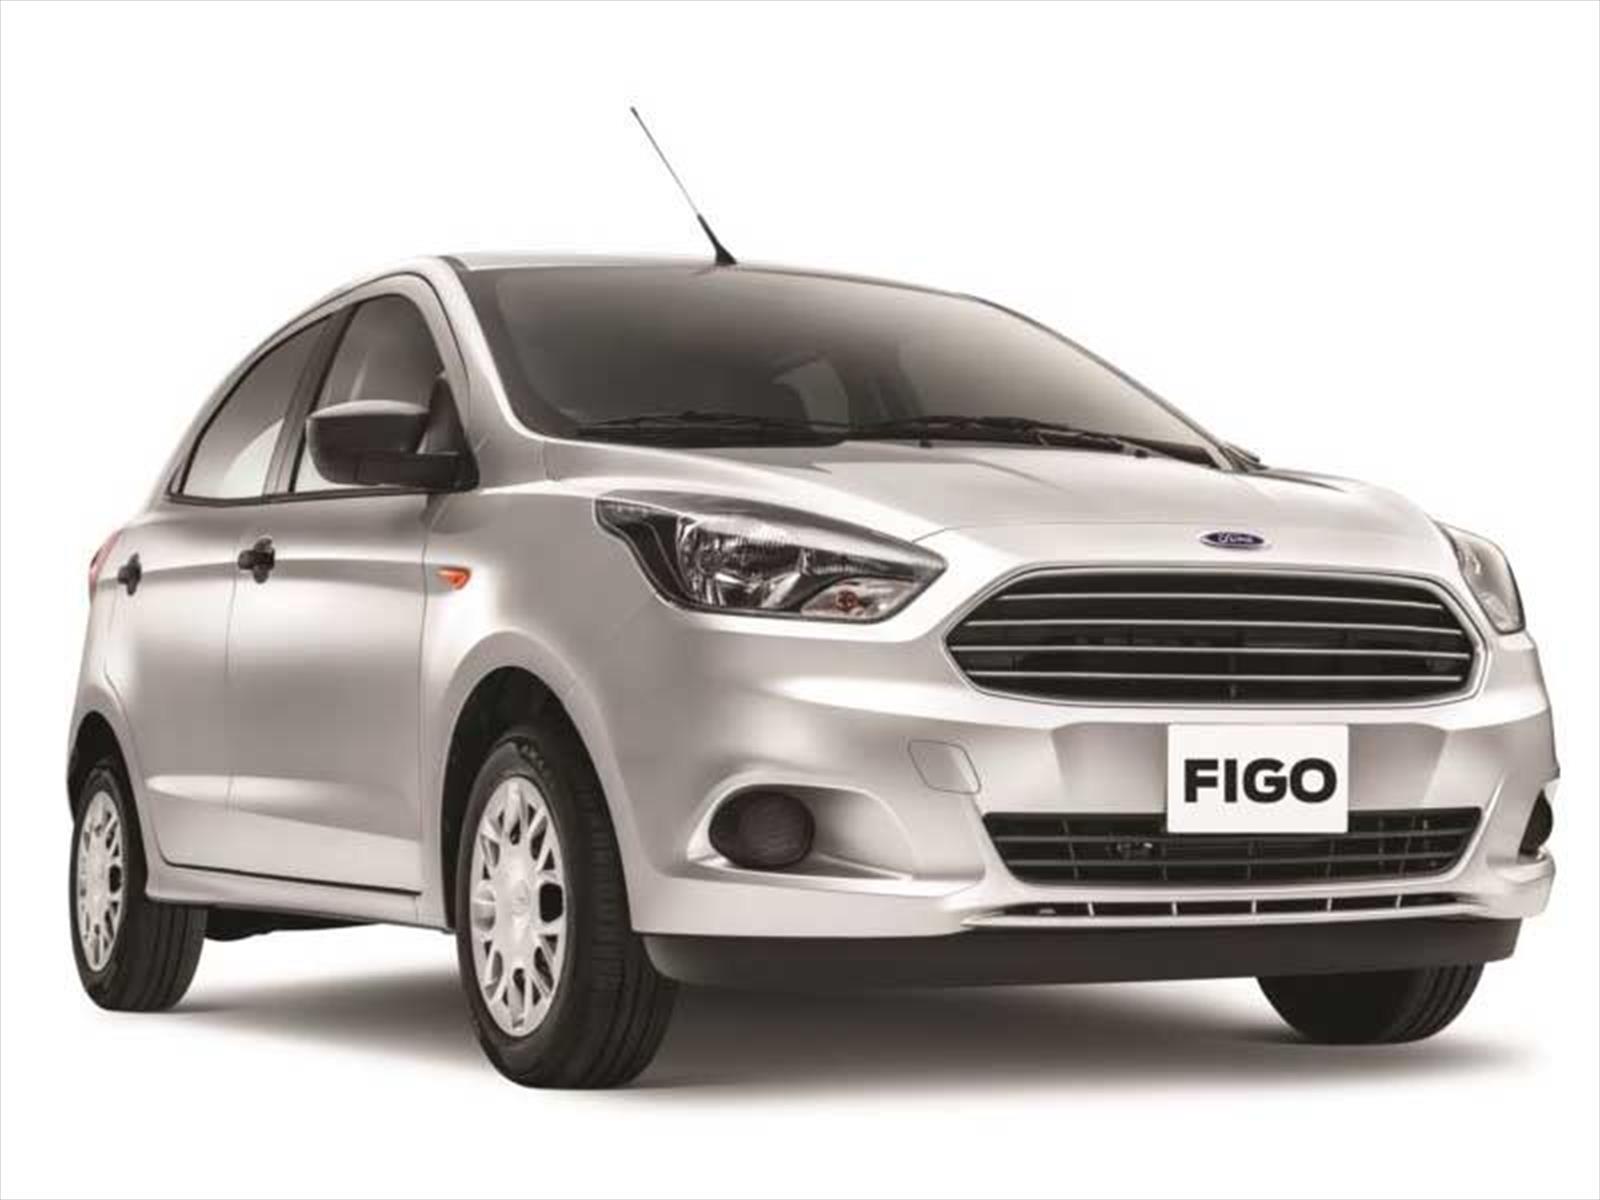 Ford Figo 2016 Se Confirma La Llegada A M 233 Xico Del Peque 241 O